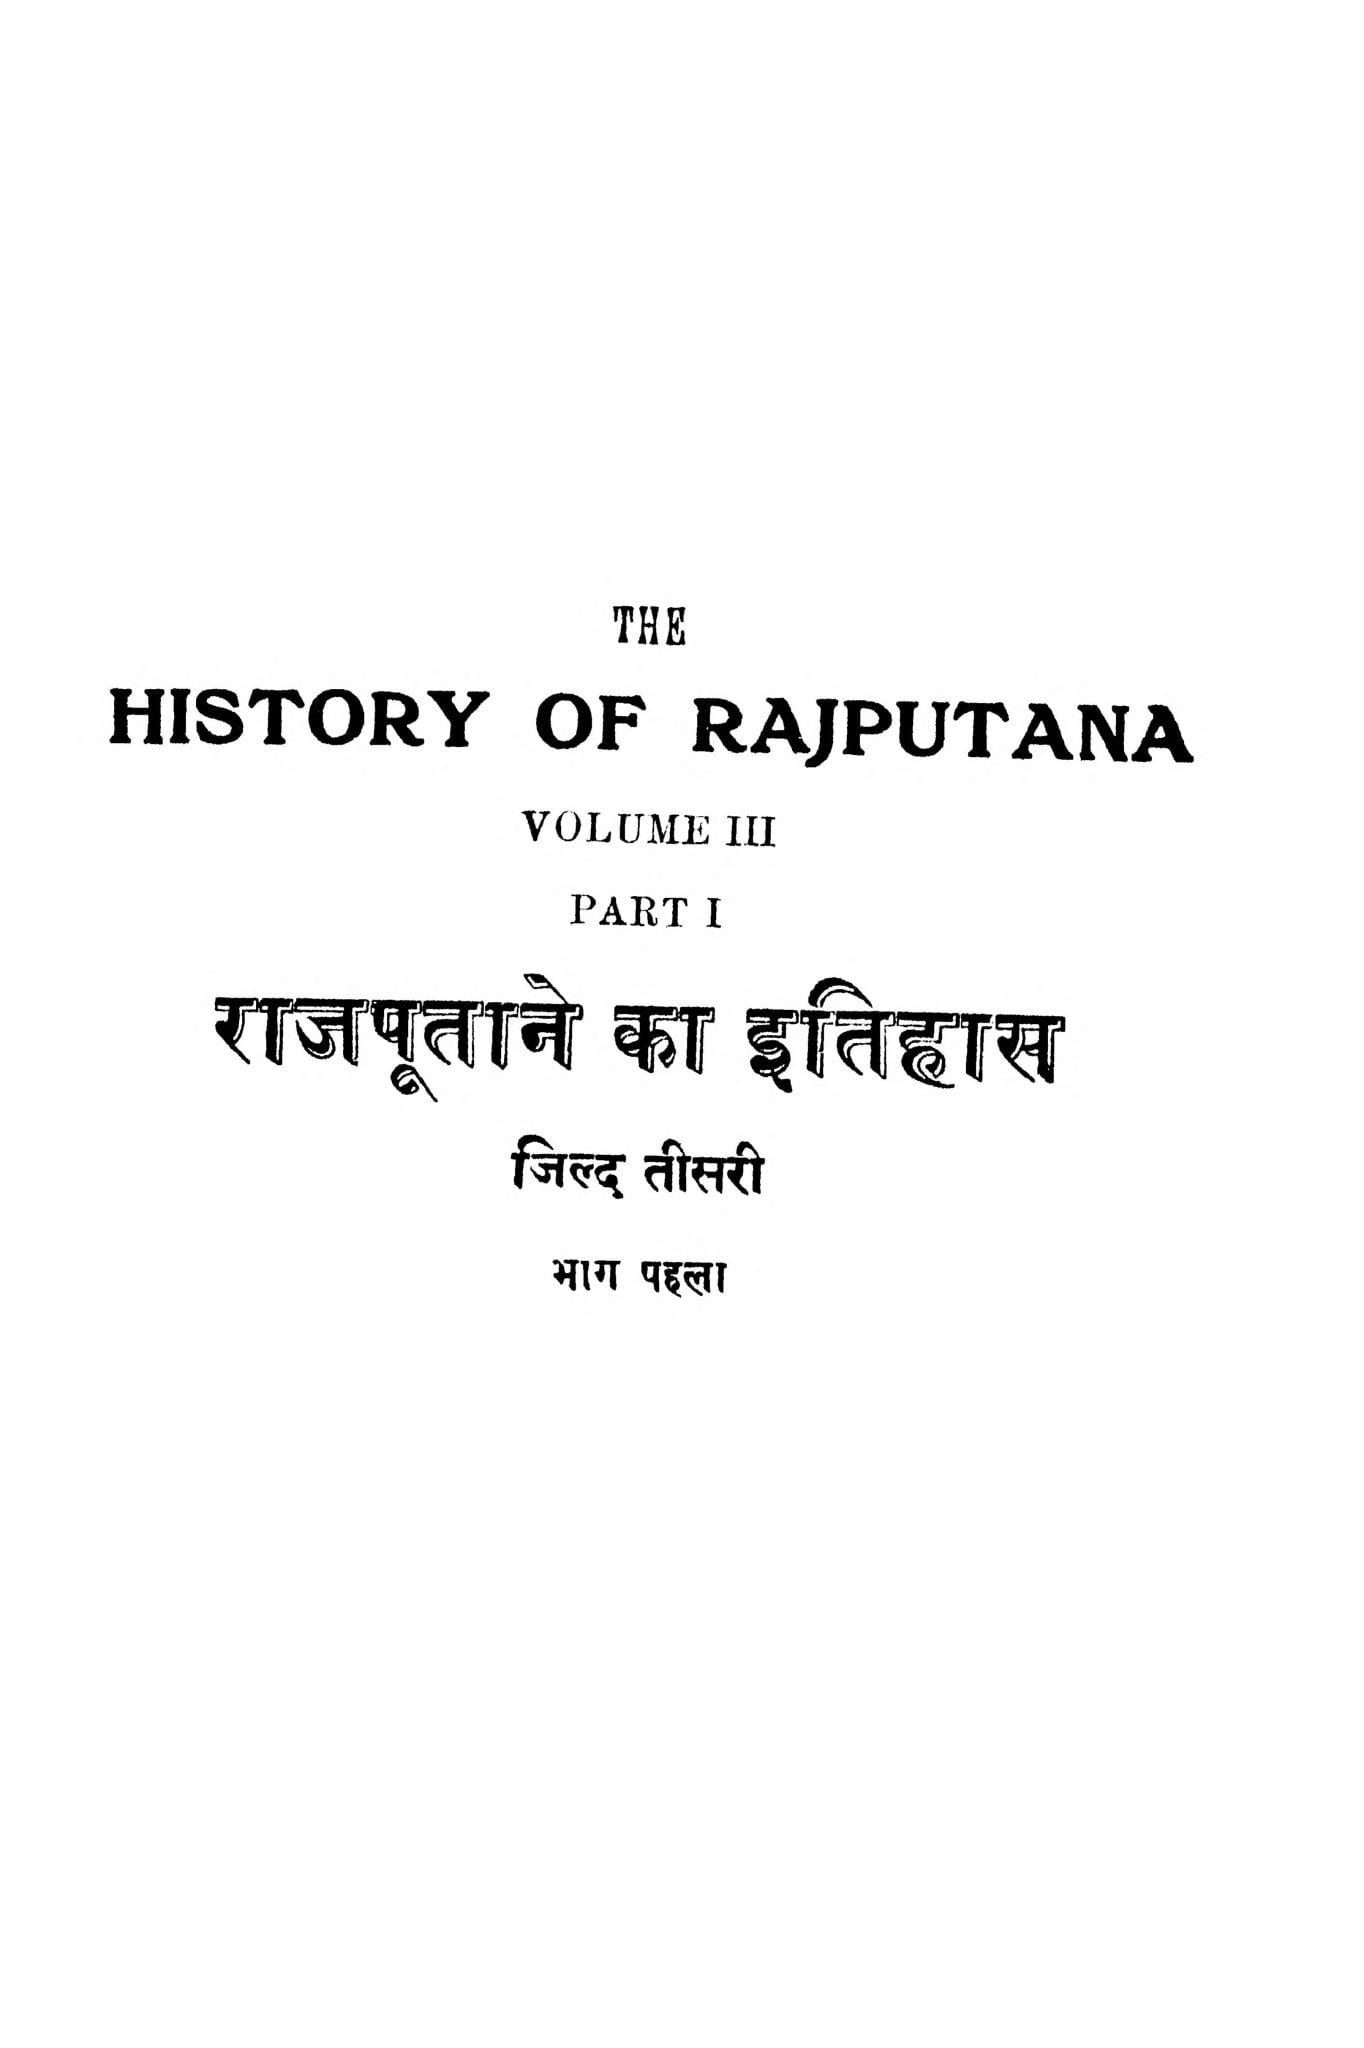 The History Of Rajputana  Vol. 3  Part. 1 by महामहोपाध्याय राय बहादुर पंडित गौरीशंकर हीराचन्द्र ओझा - Mahamahopadhyaya Rai Bahadur Pandit Gaurishankar Hirachand Ojha